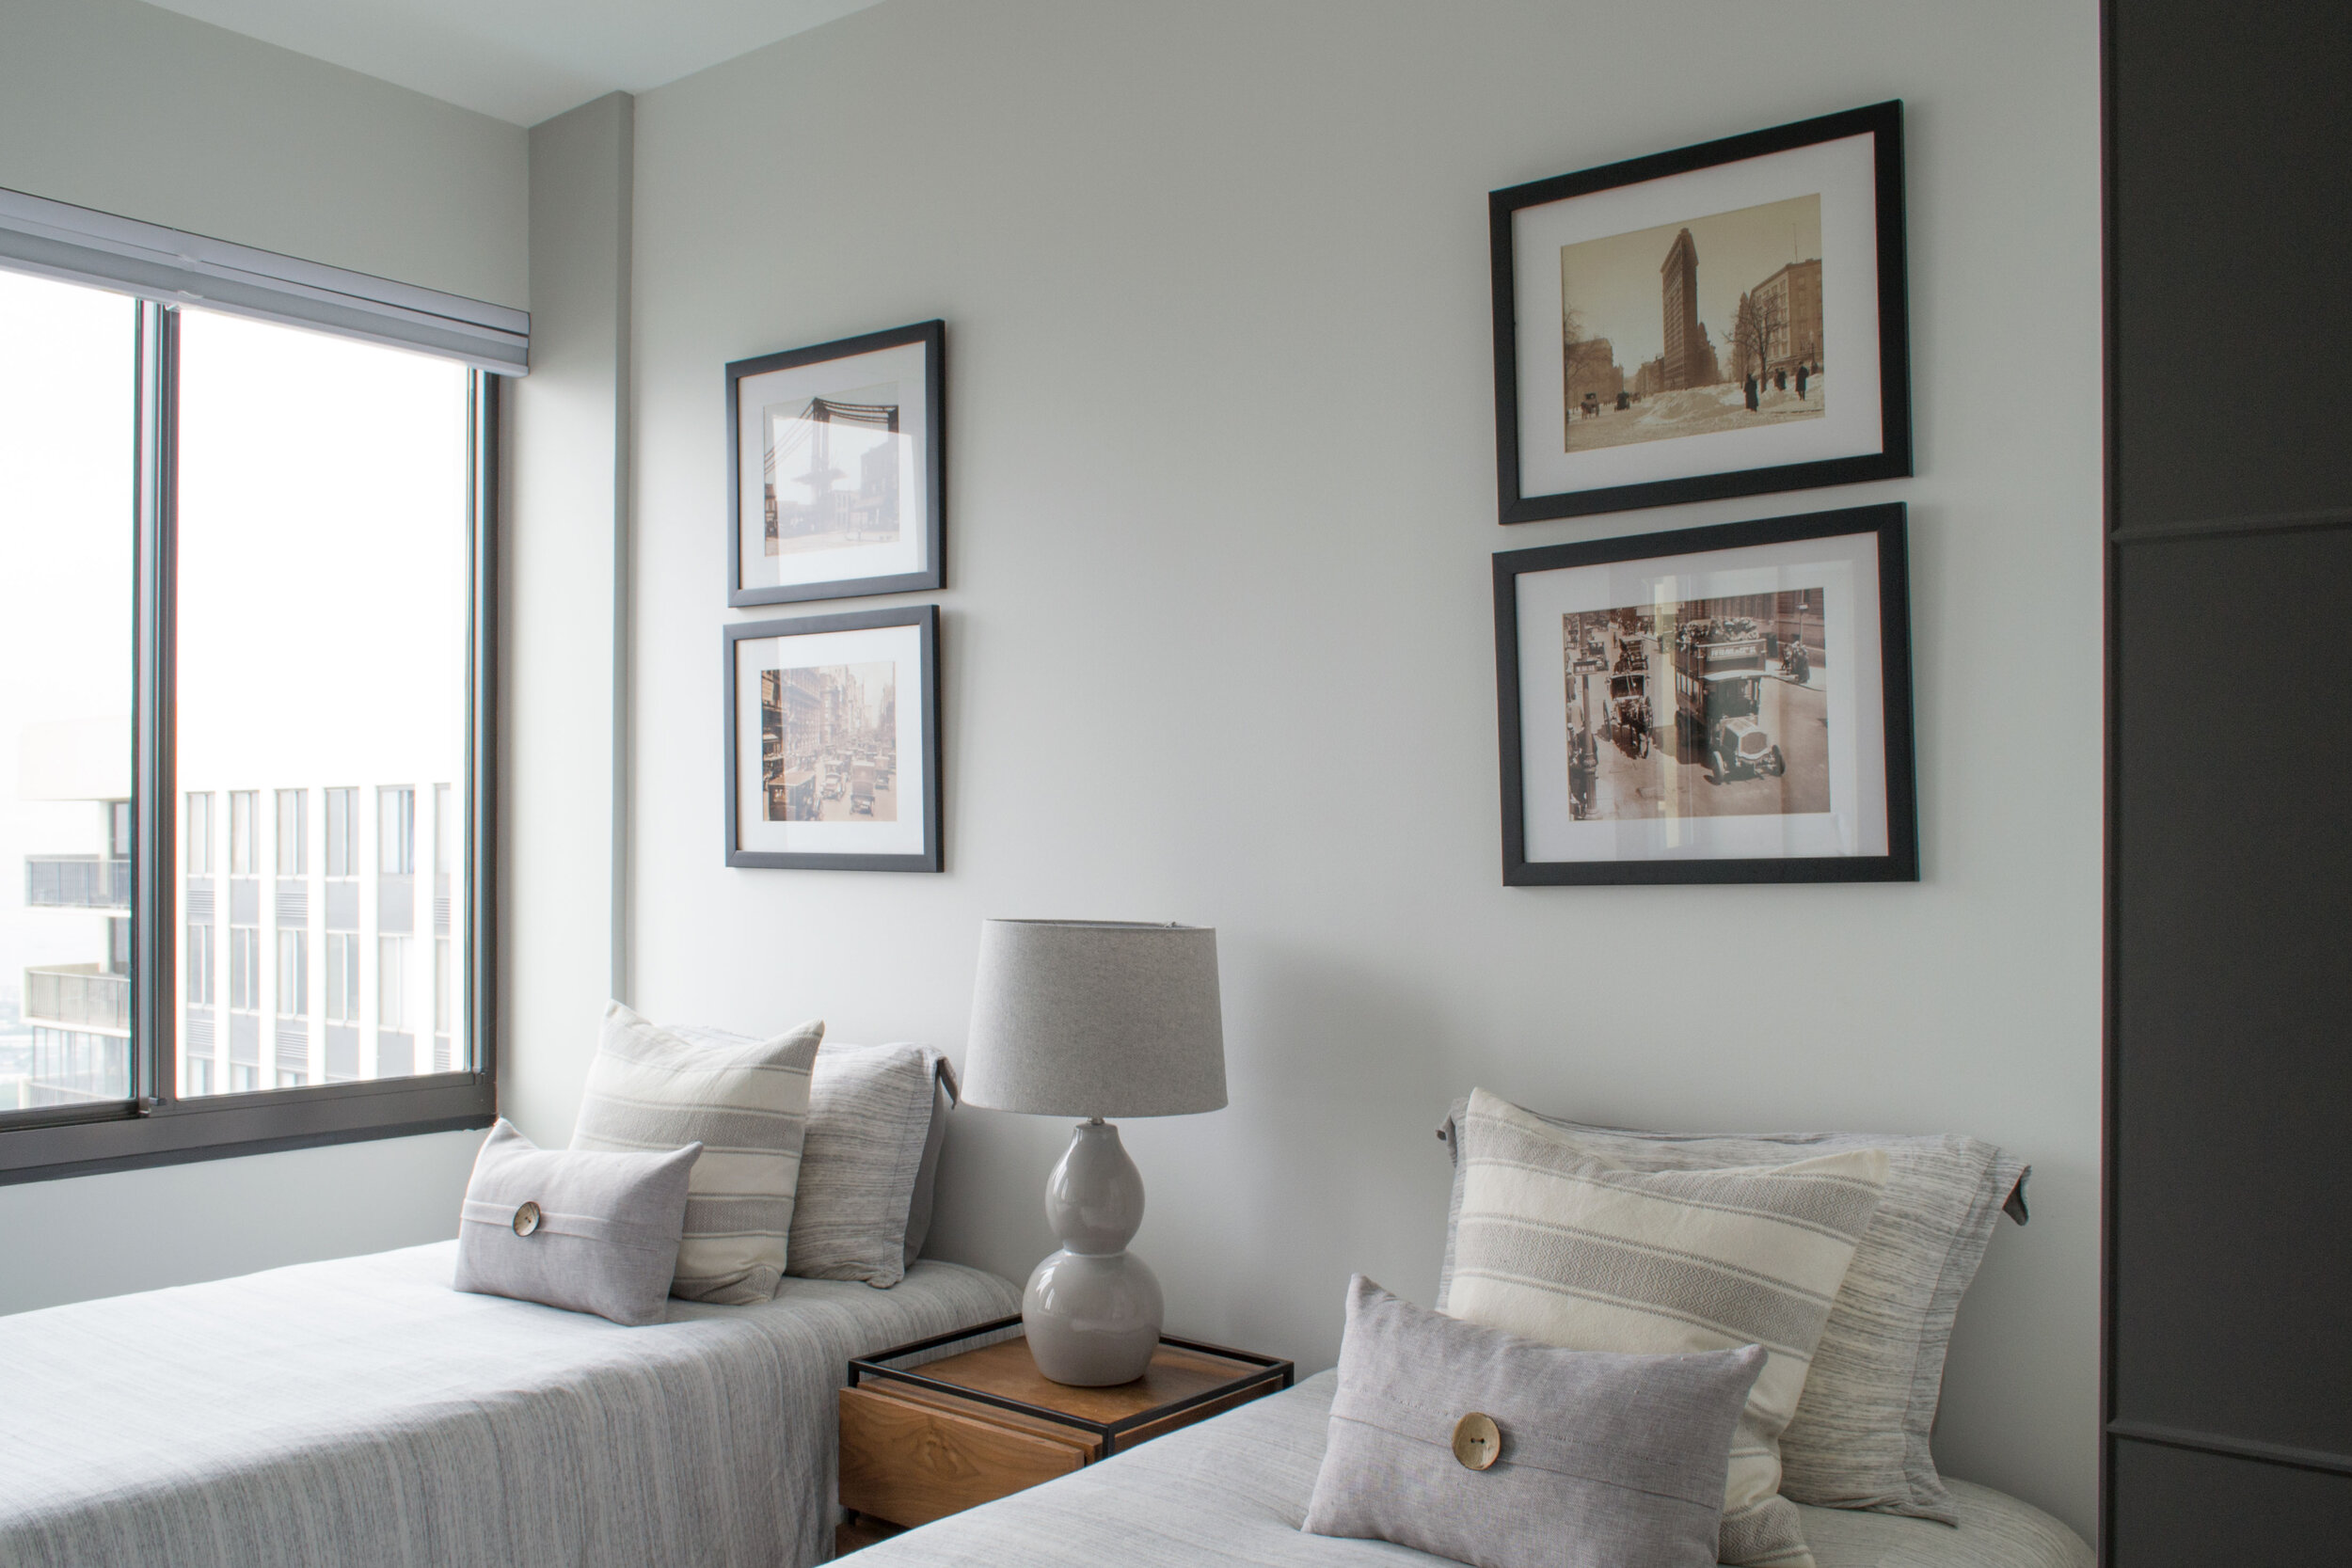 guest-room-modern-tc-interiors-1.jpg